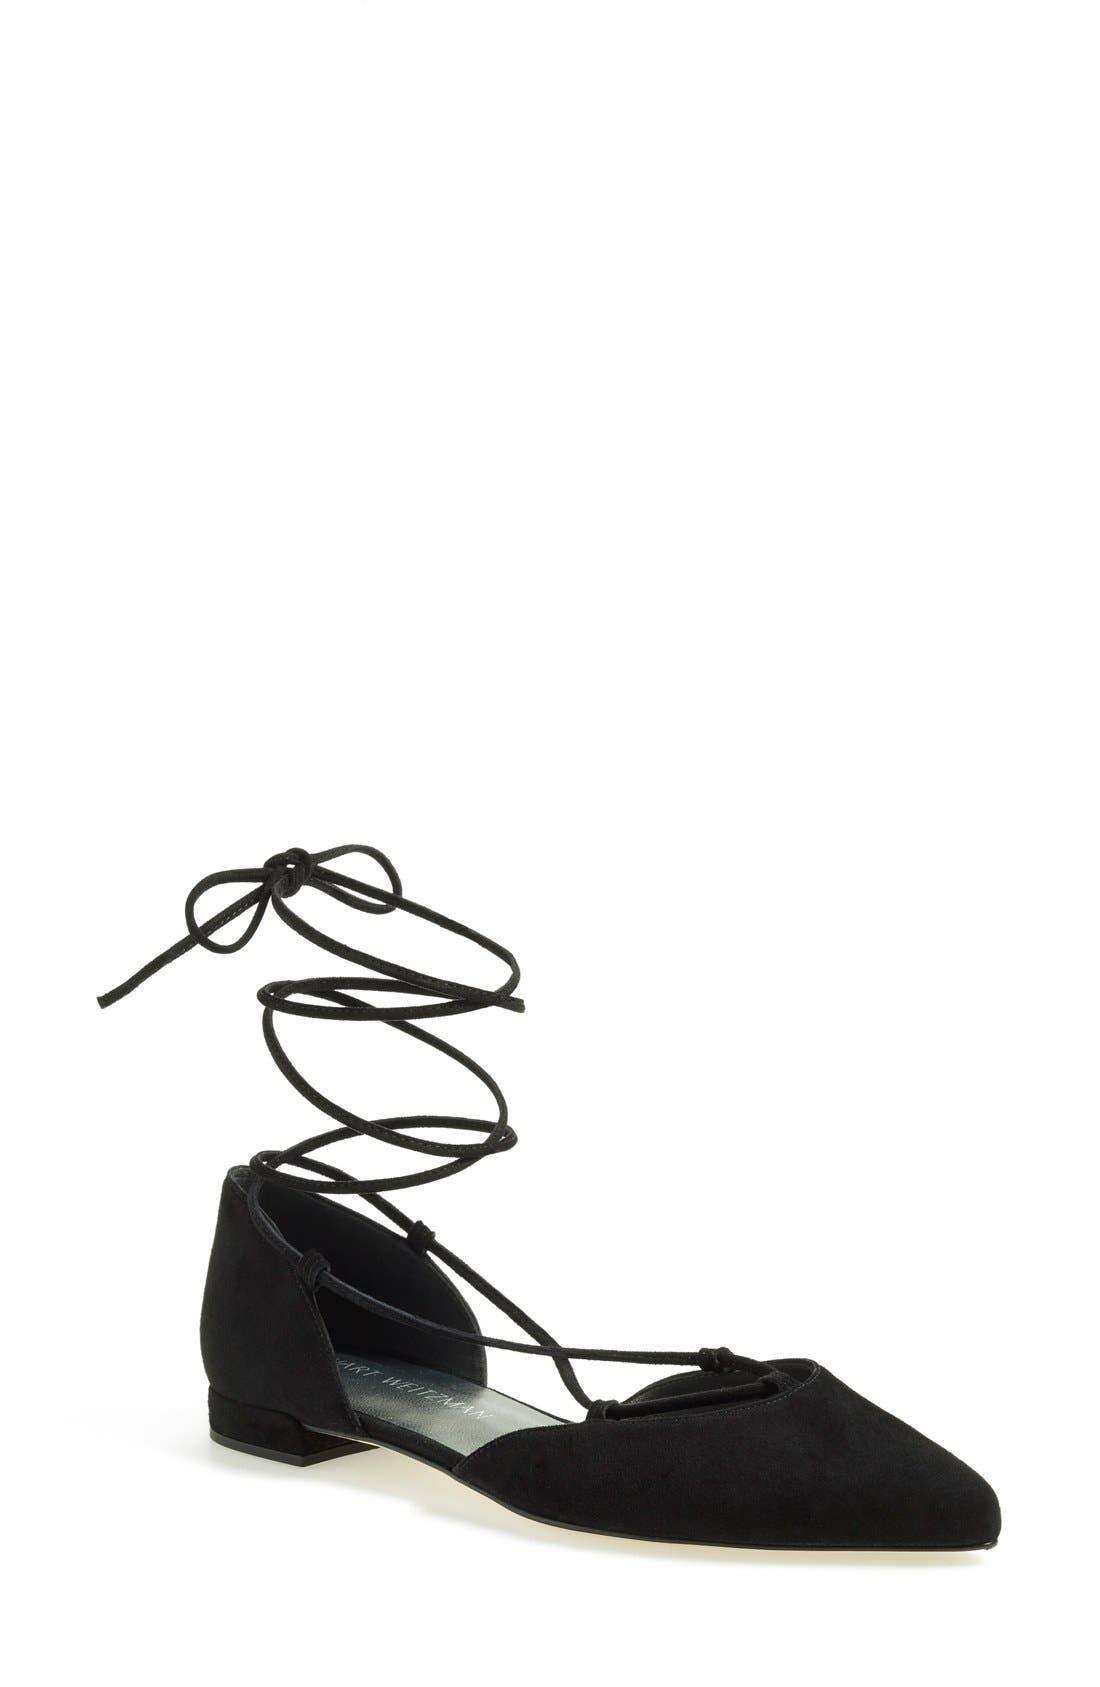 Alternate Image 1 Selected - Stuart Weitzman 'Tyler' Wraparound Lace Flat (Women) (Nordstrom Exclusive)